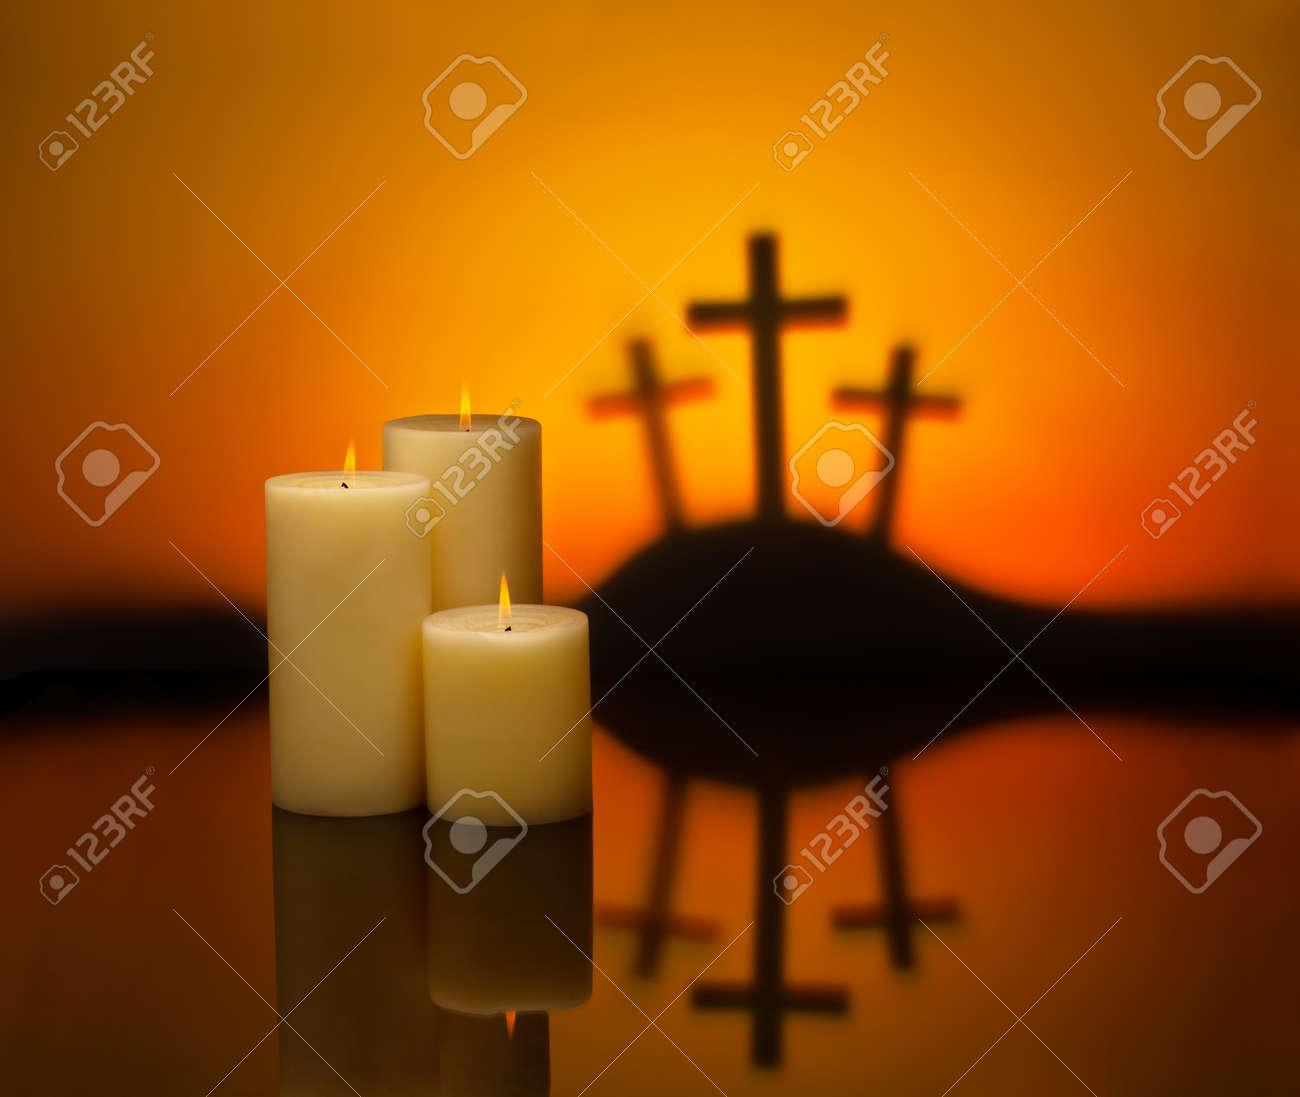 three crosses symbolic for jesus crucifixion in golgotha and